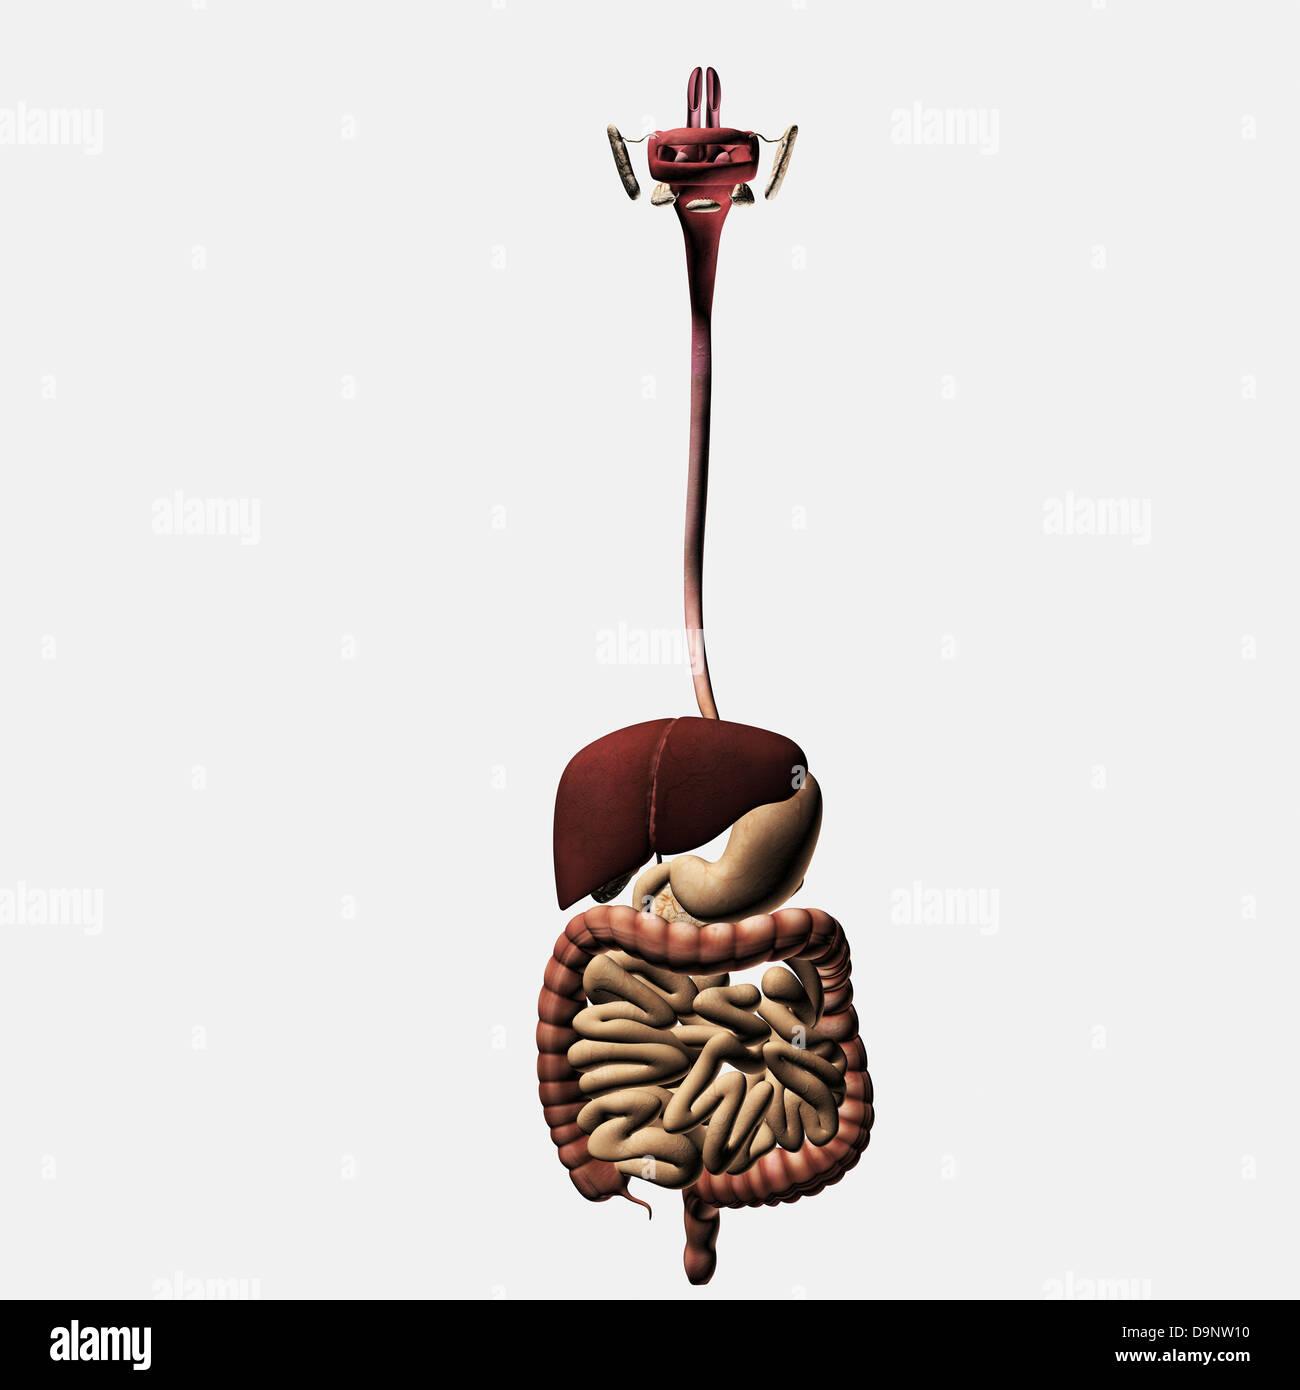 Small Intestine Anatomy Stockfotos & Small Intestine Anatomy Bilder ...